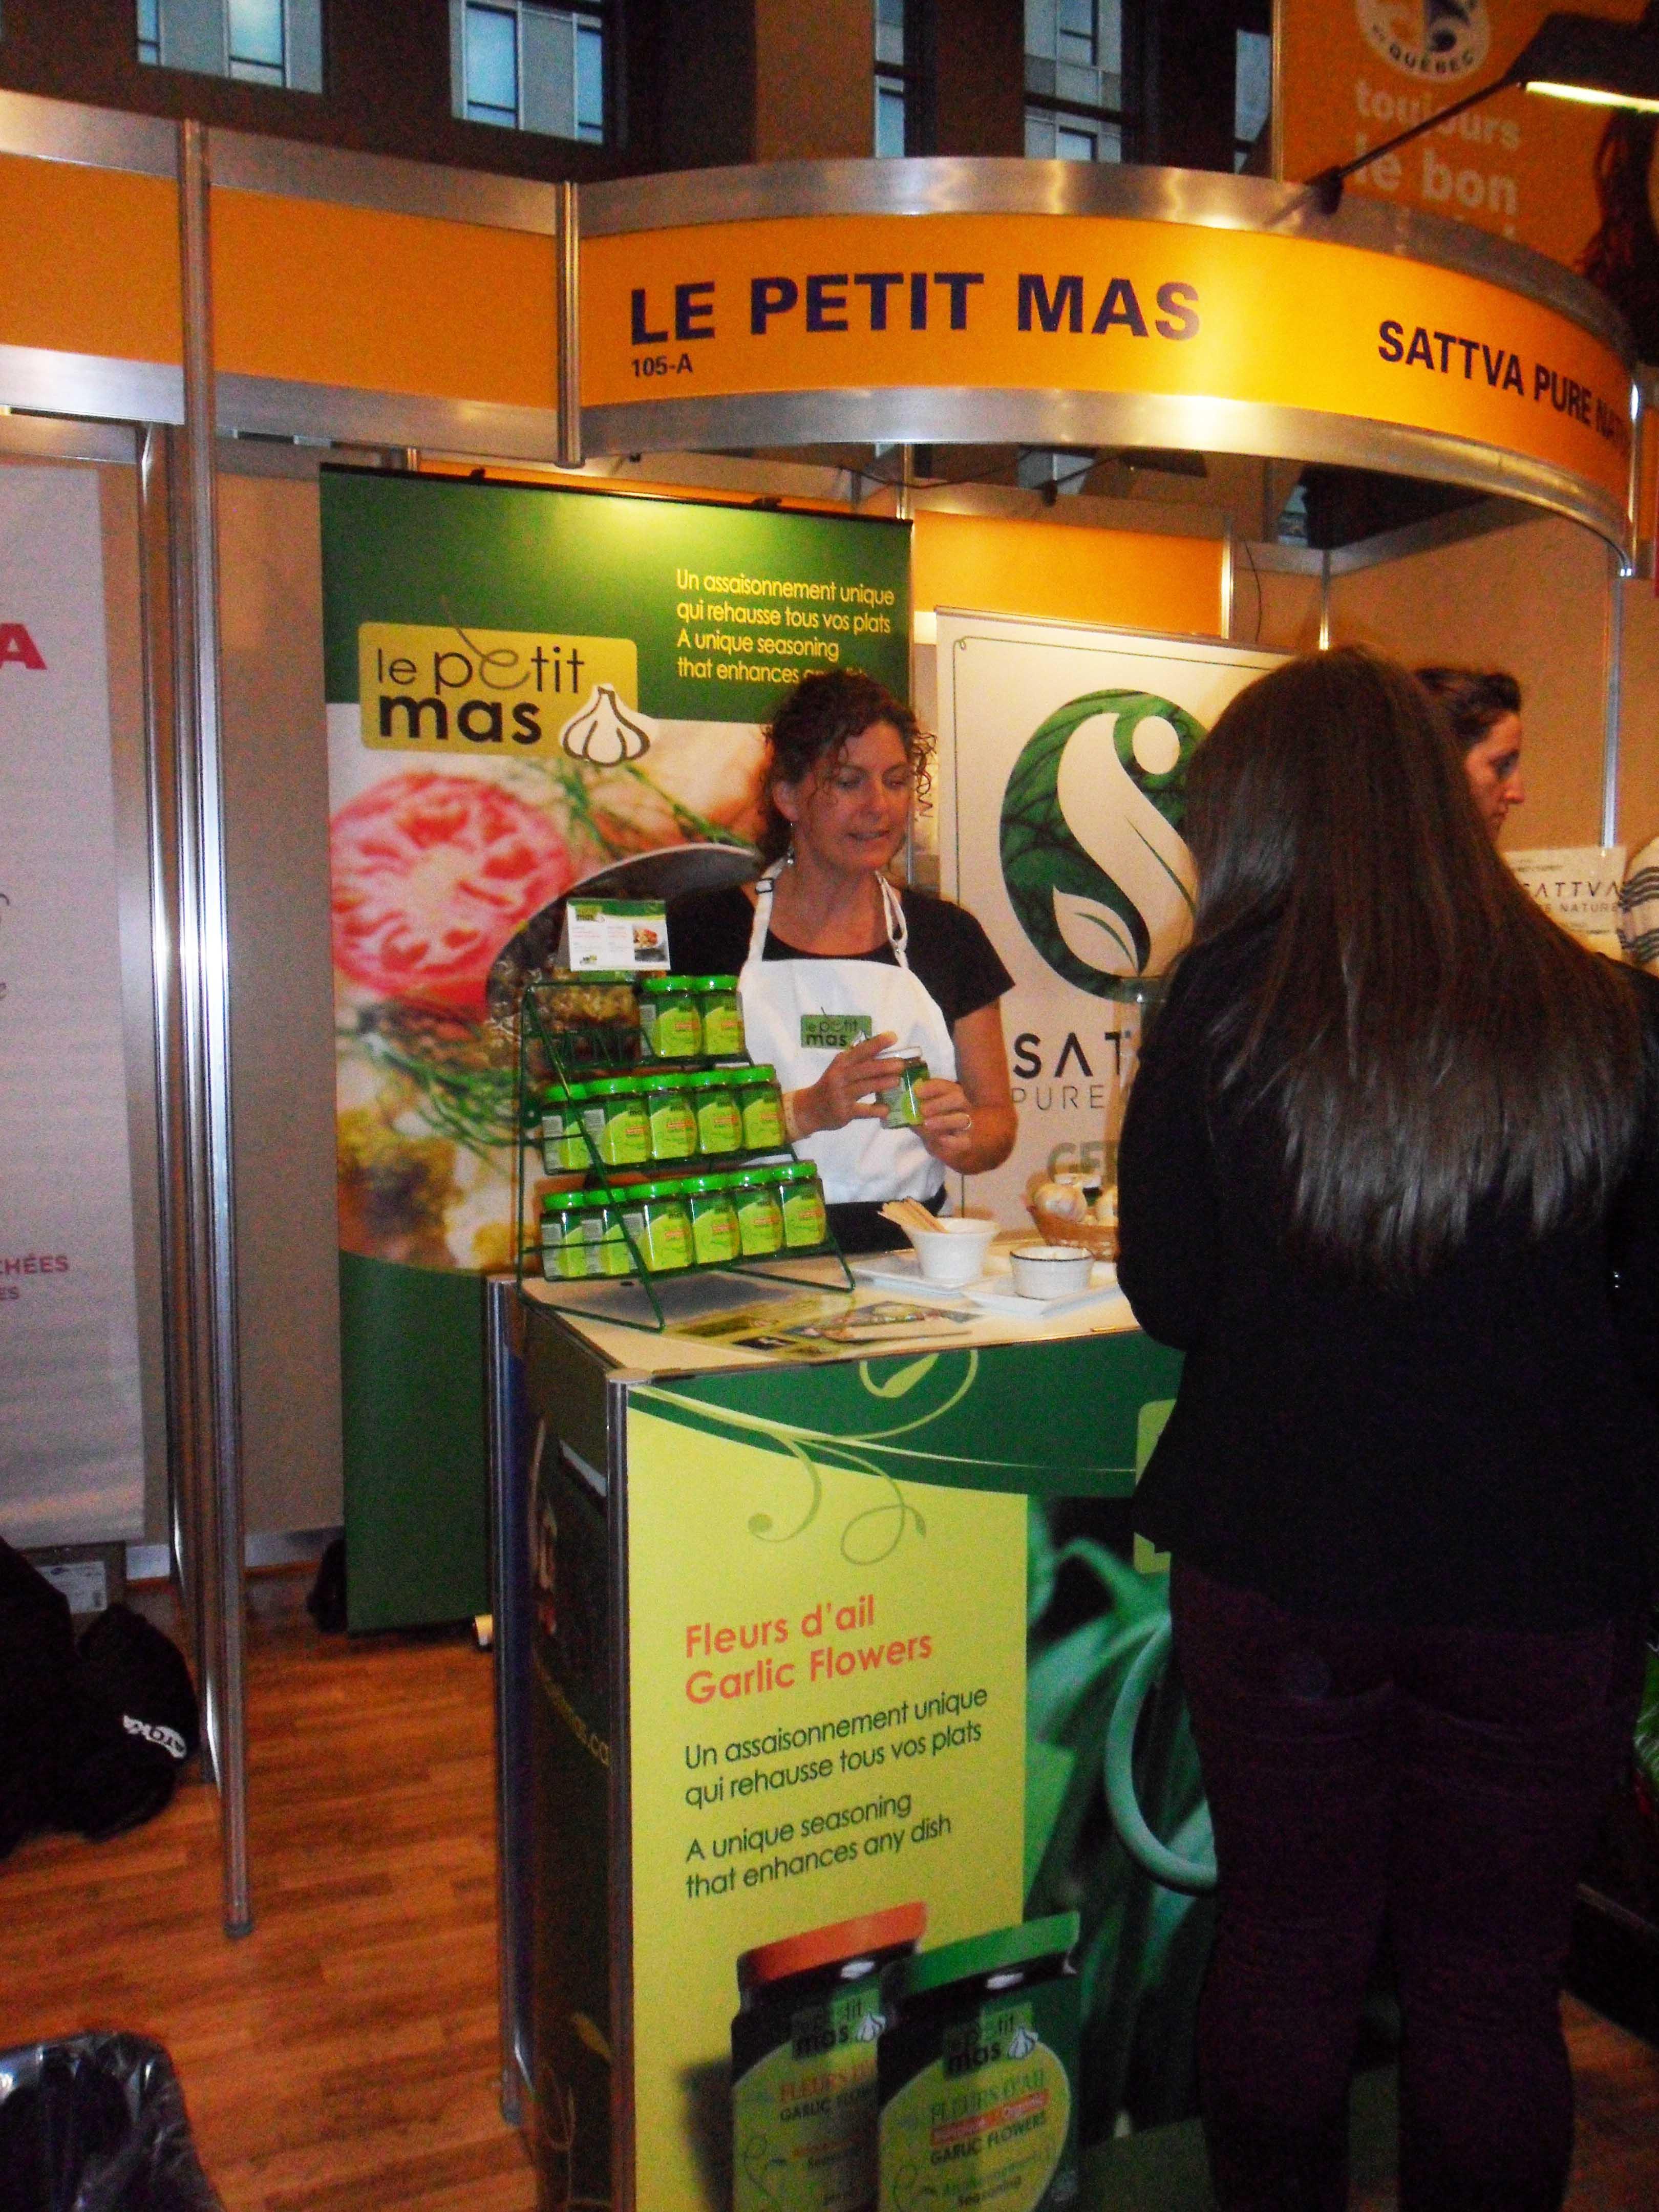 Expo-Le Petit Mas - 2013